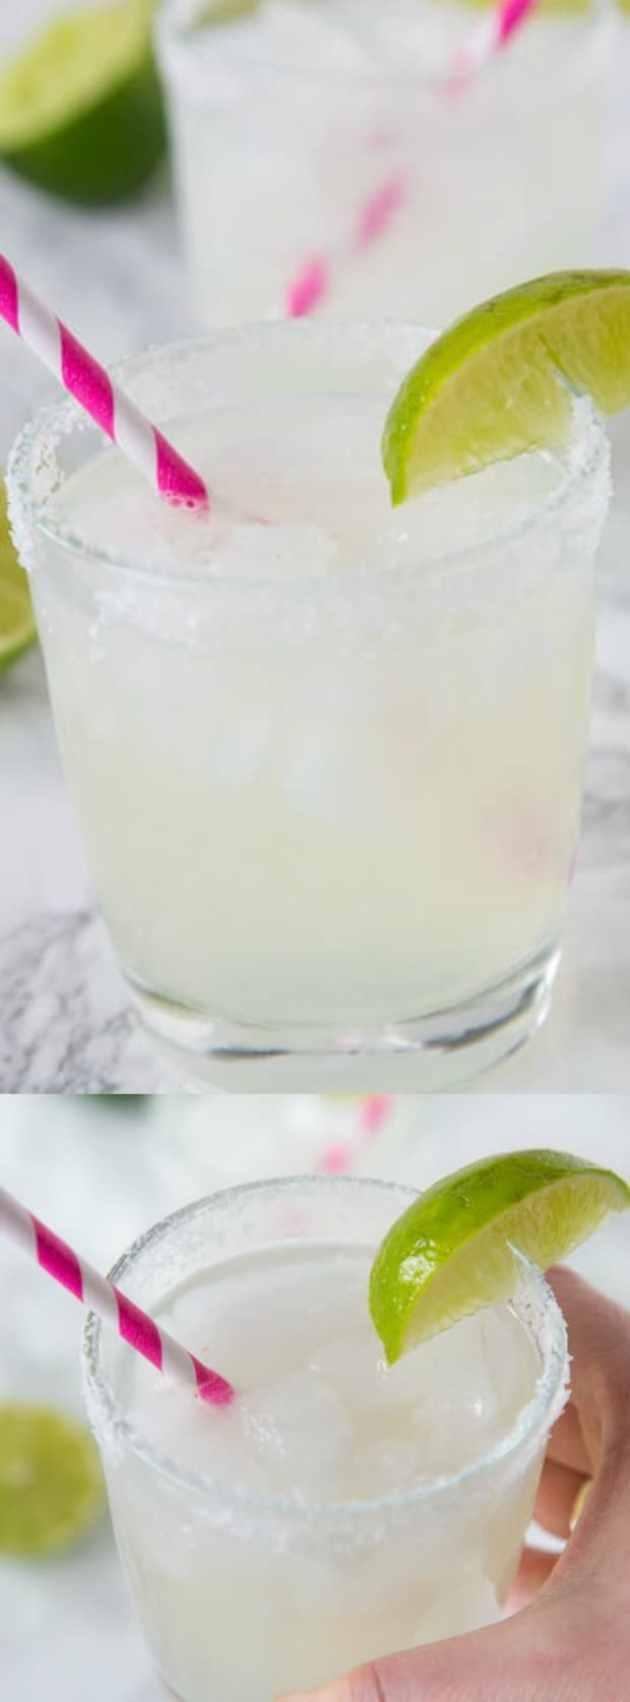 classic lime margarita on the rocks longpin